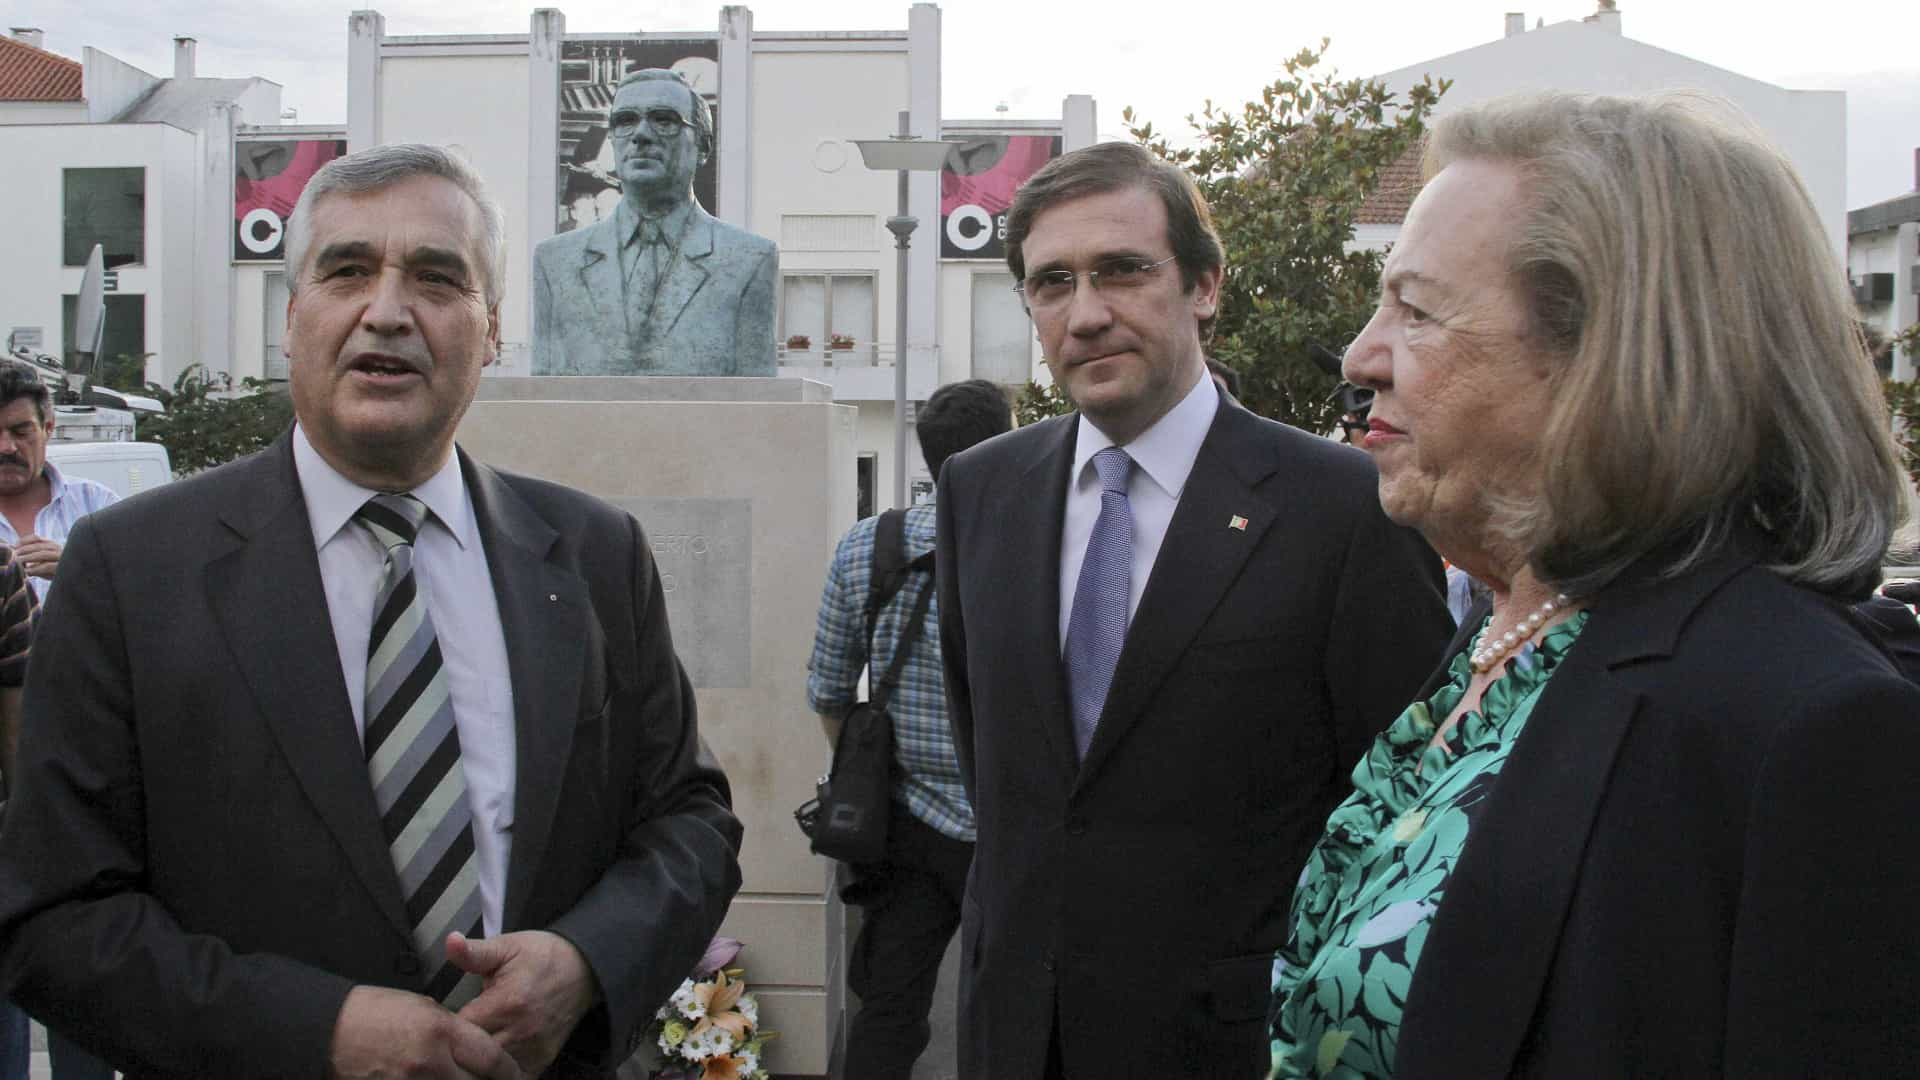 Narciso Mota sai do PSD e candidata-se como independente a Pombal